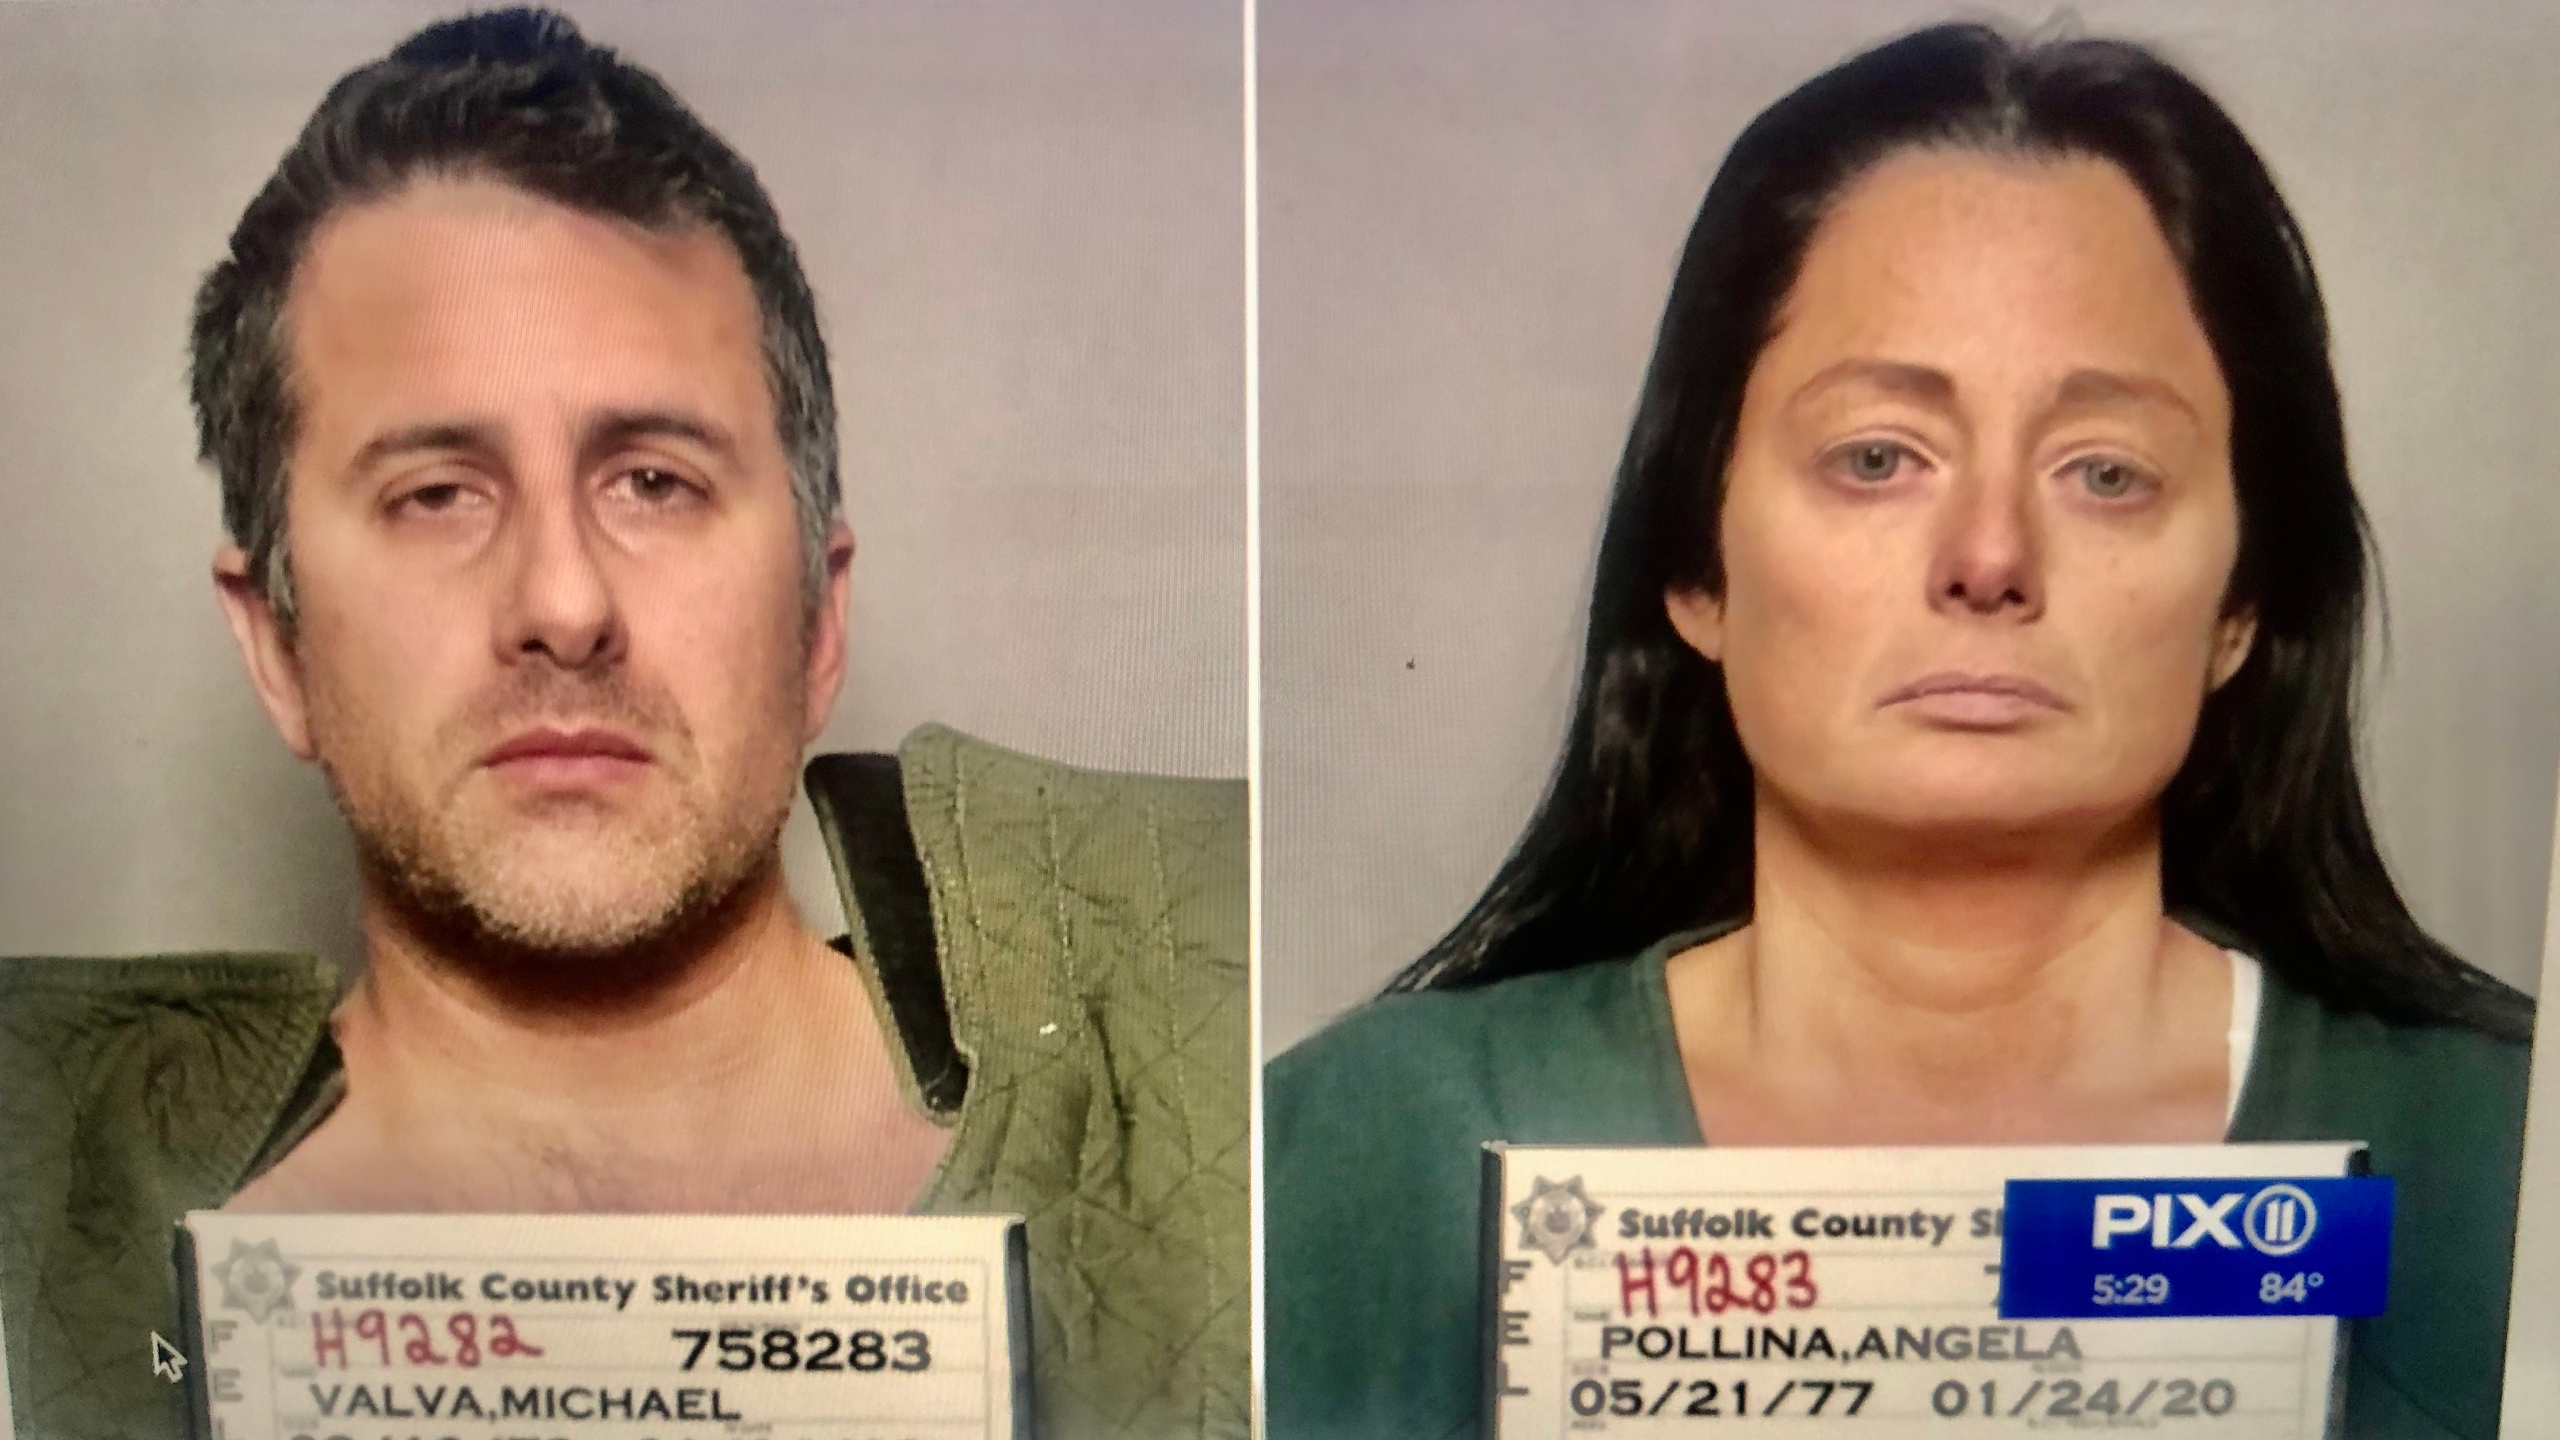 Michael Valva and Angela Pollina